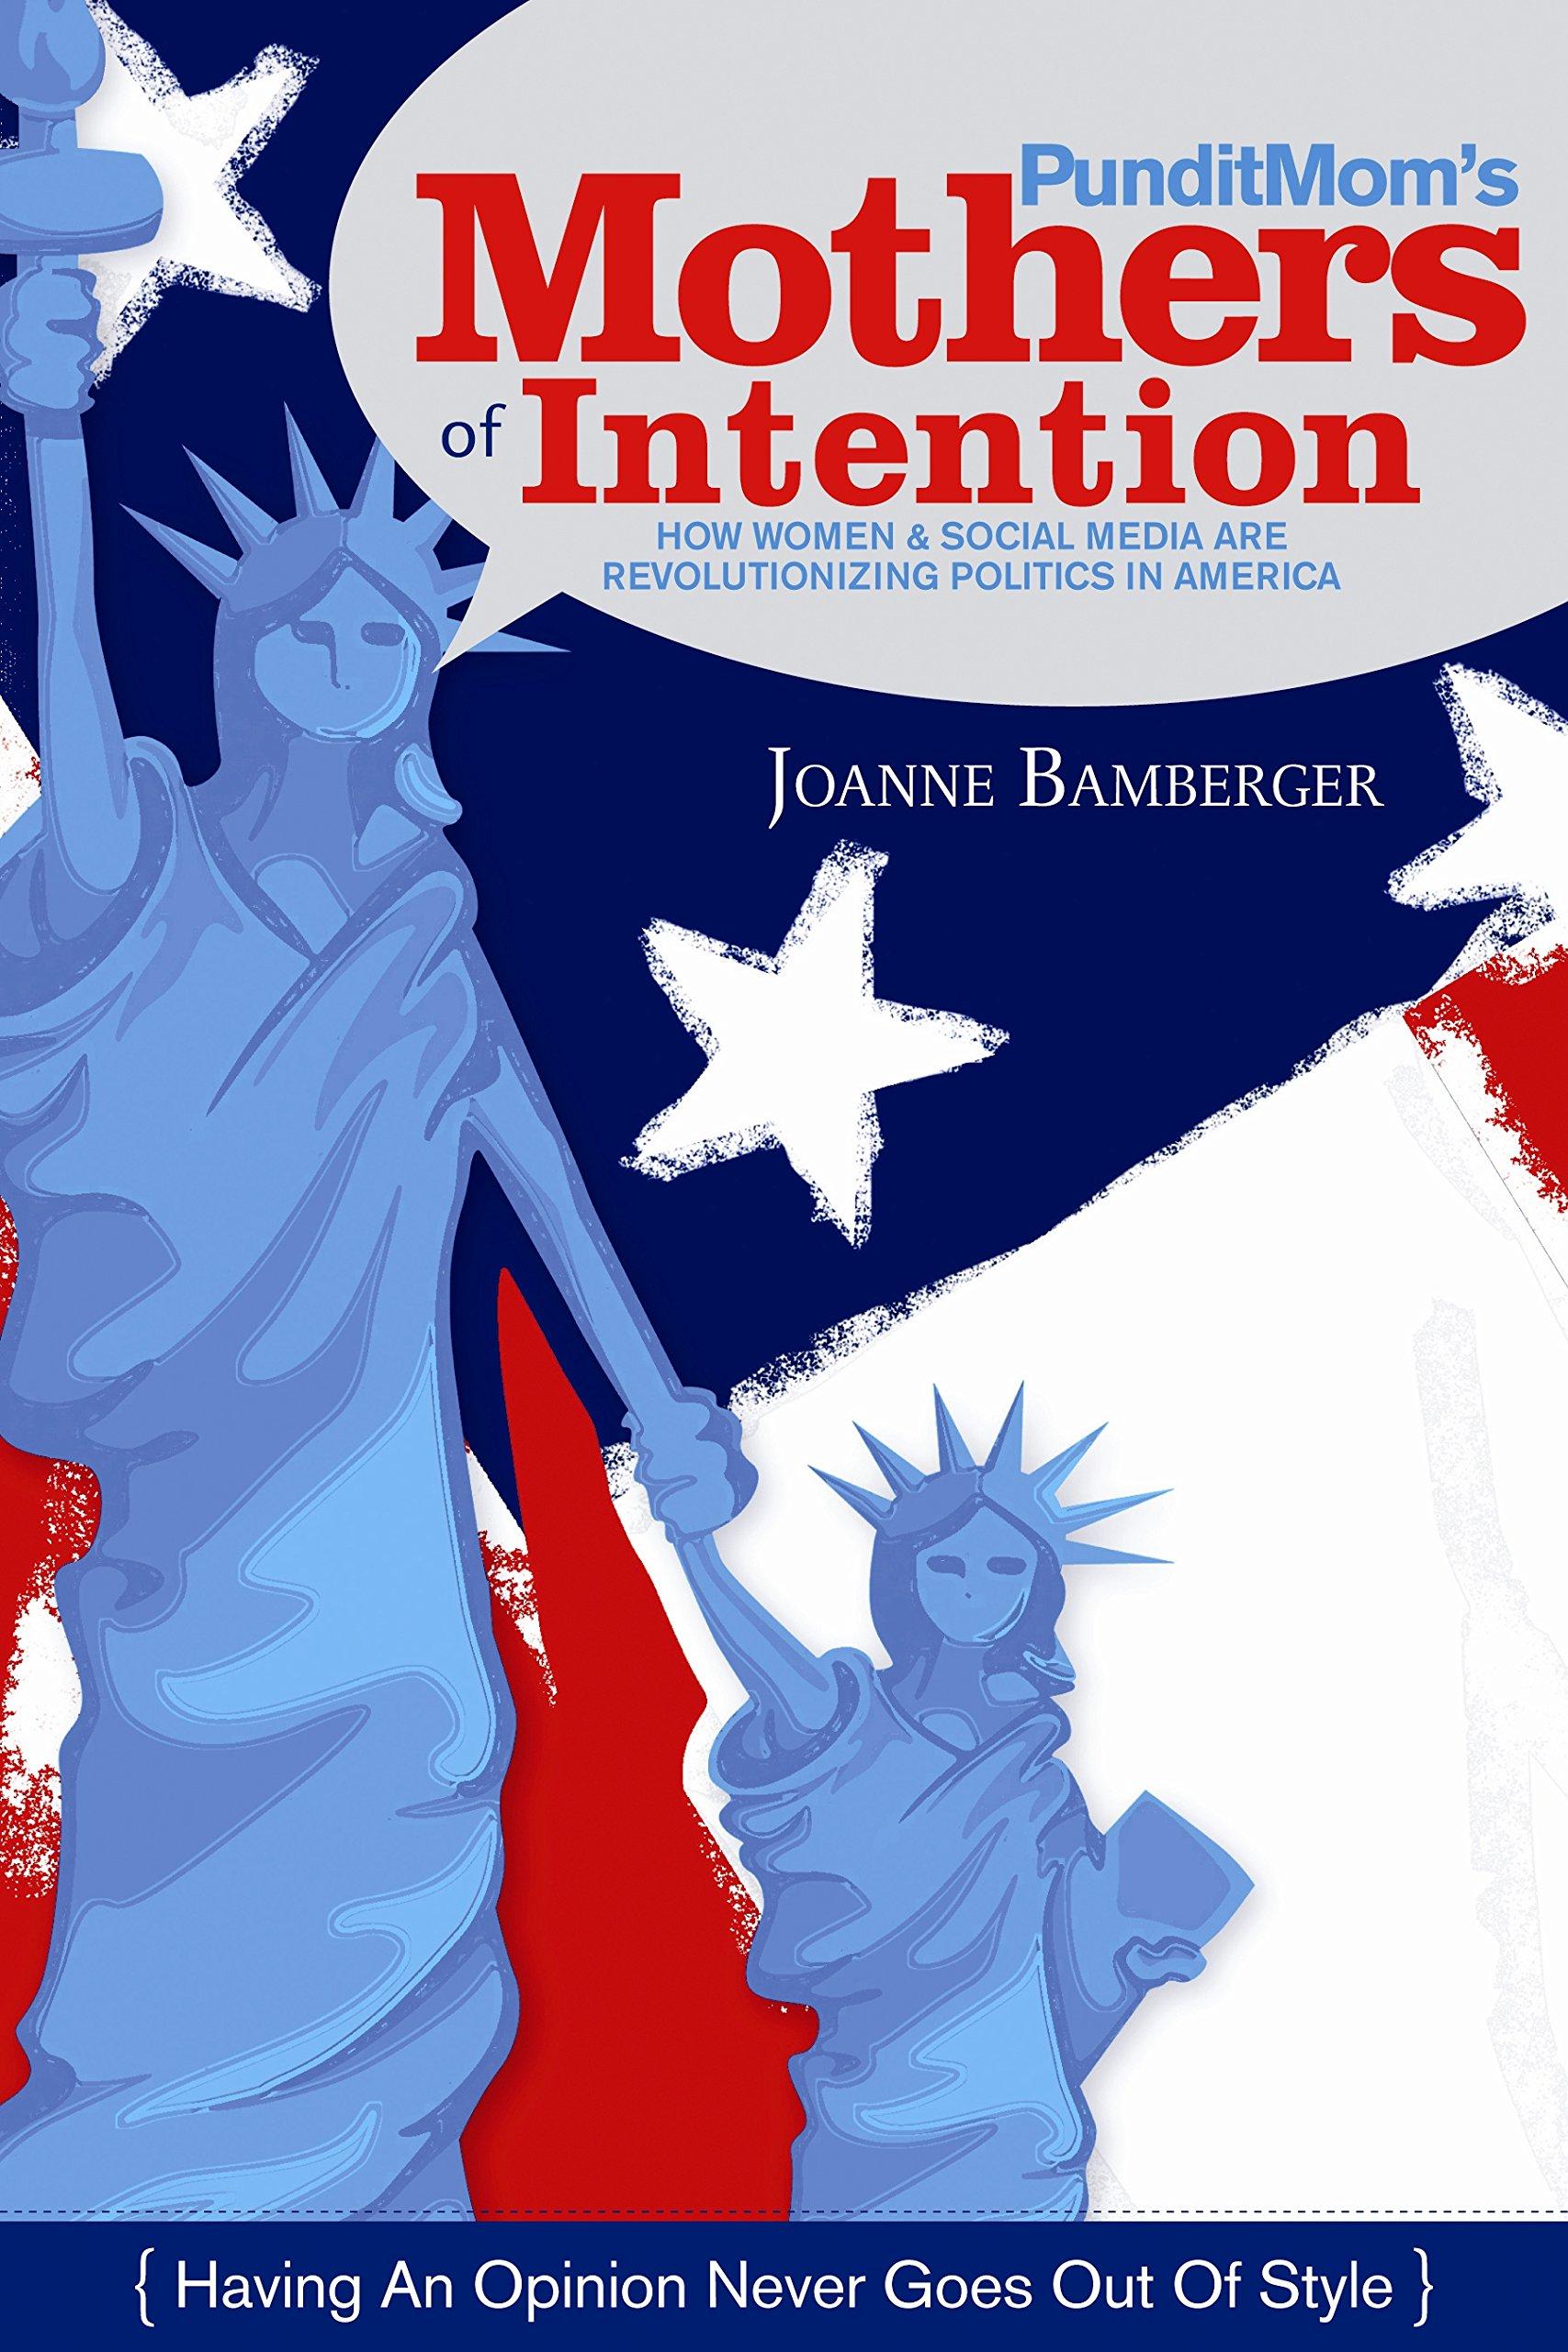 PunditMom's Mothers of Intention: How Women & Social Media Are Revolutionizing Politics in America pdf